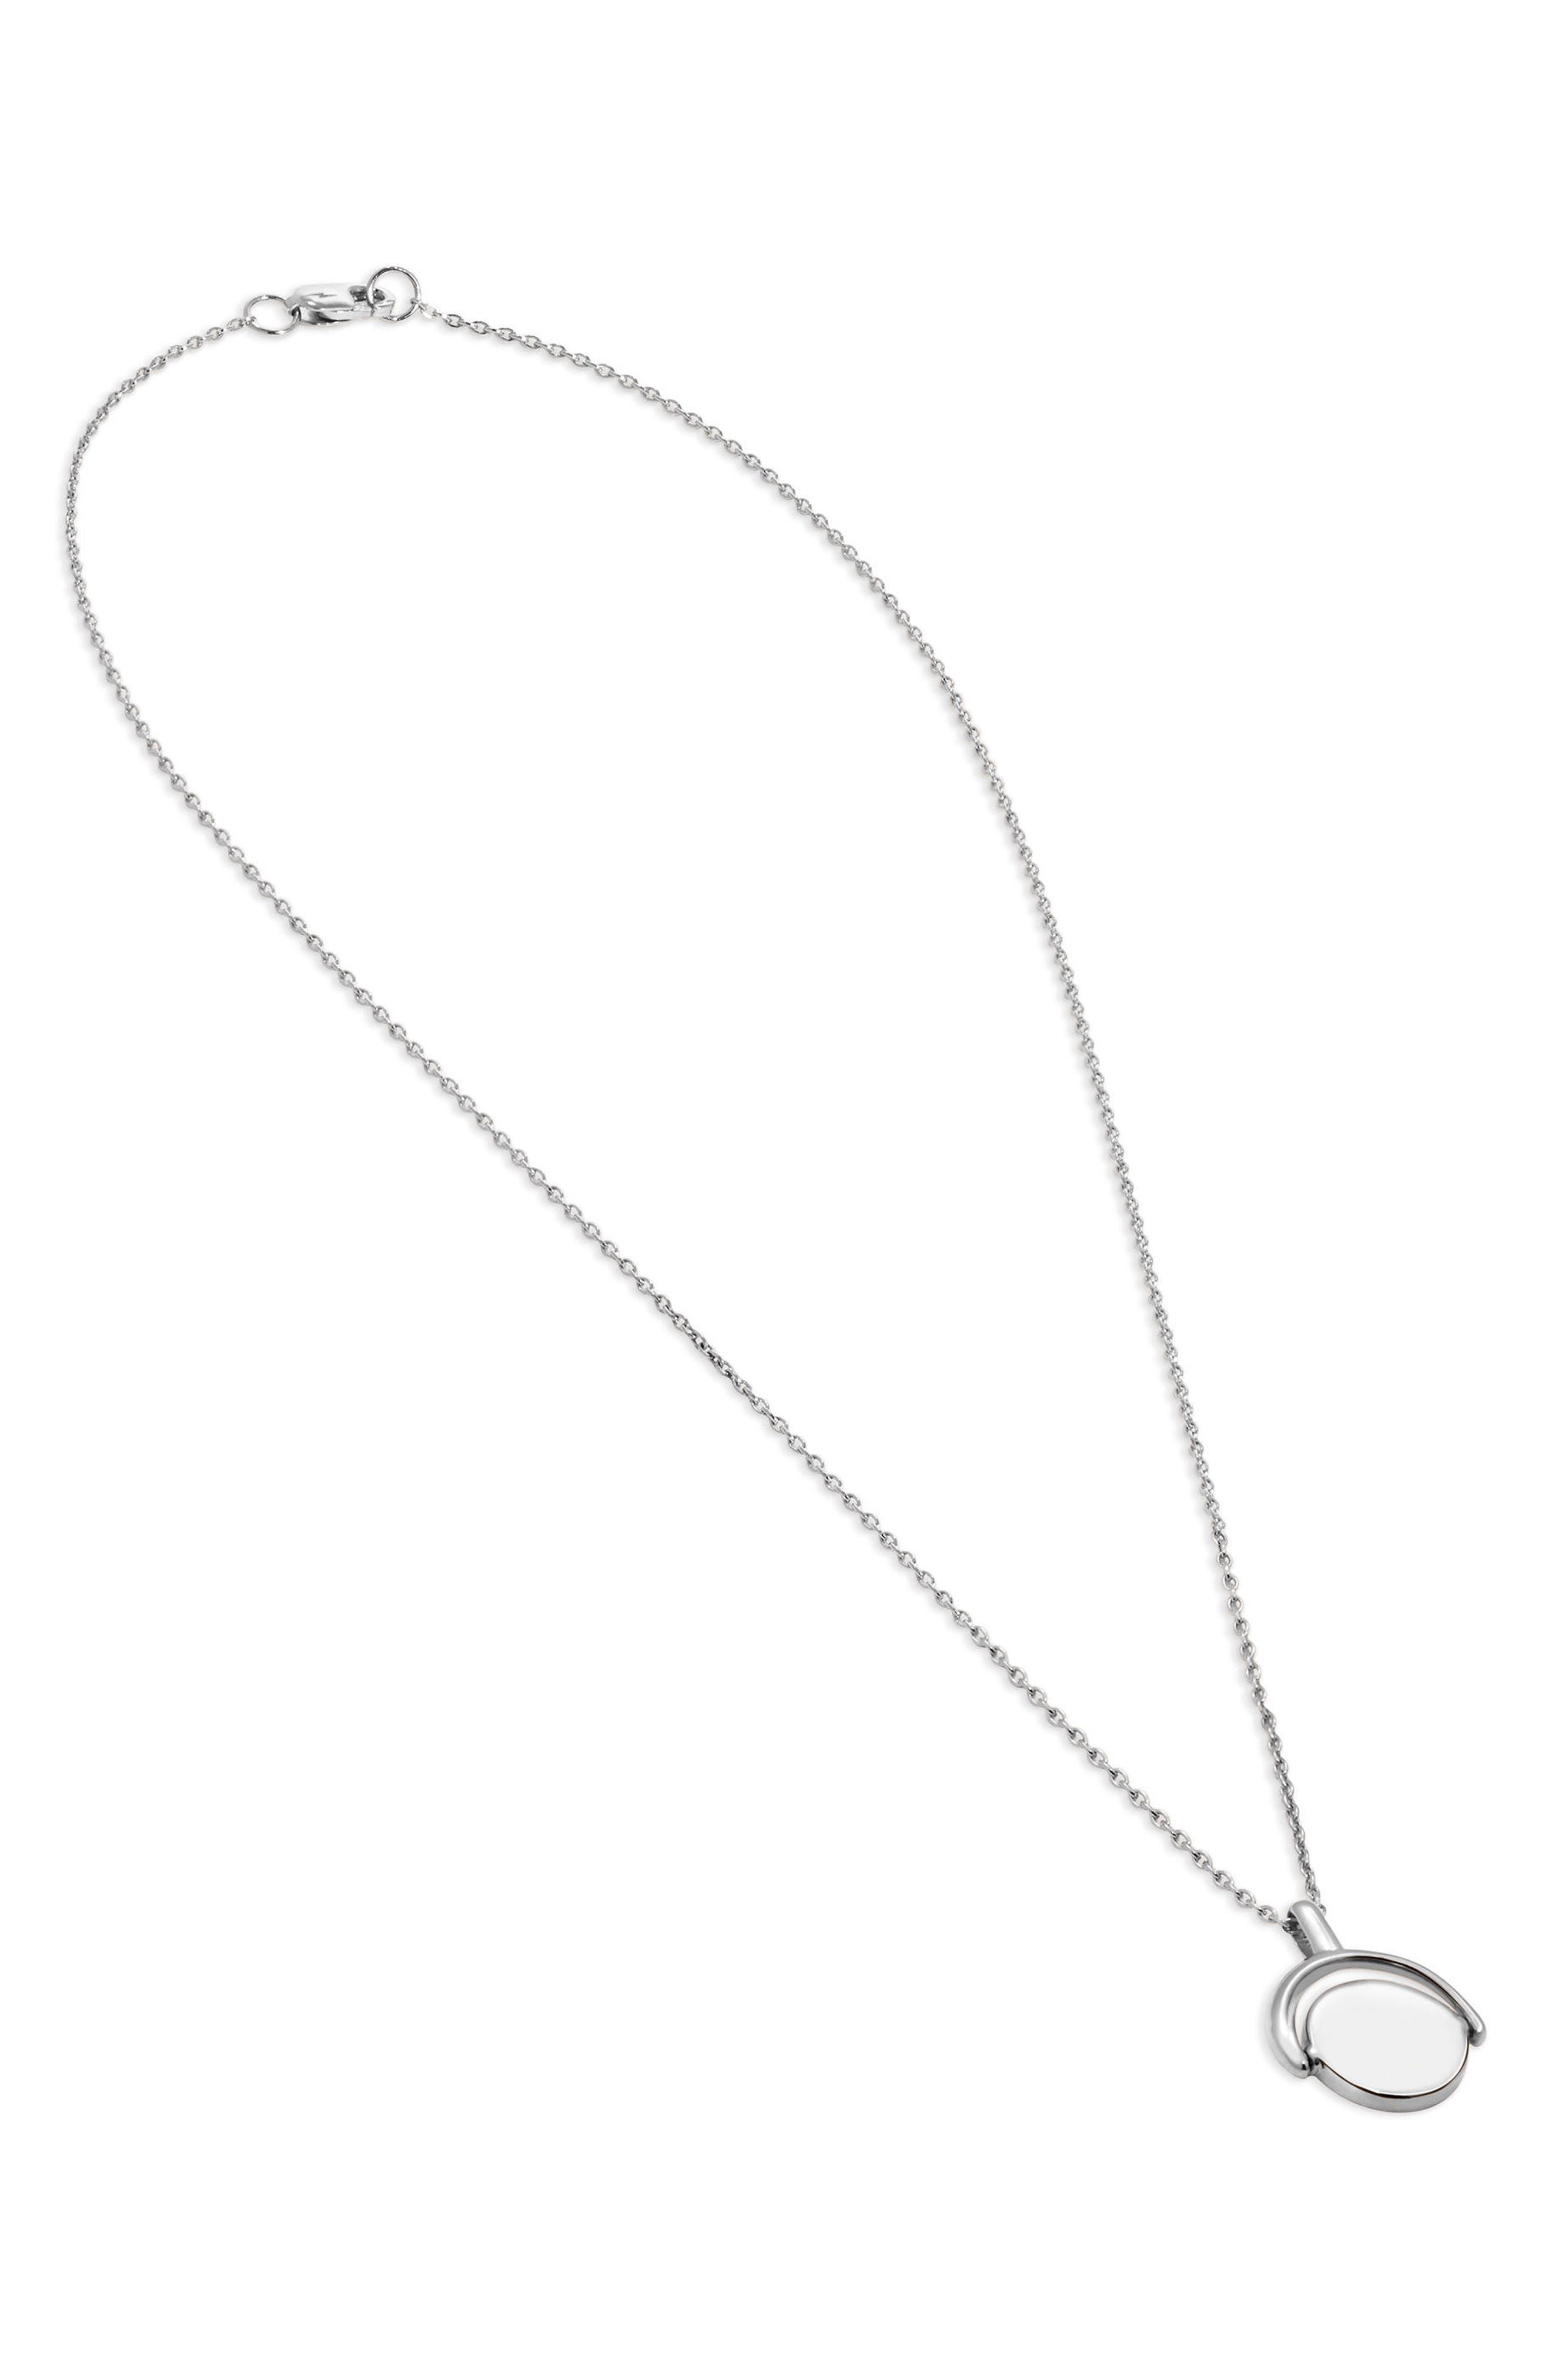 Rotating Signet Pendant Necklace,                             Alternate thumbnail 2, color,                             040